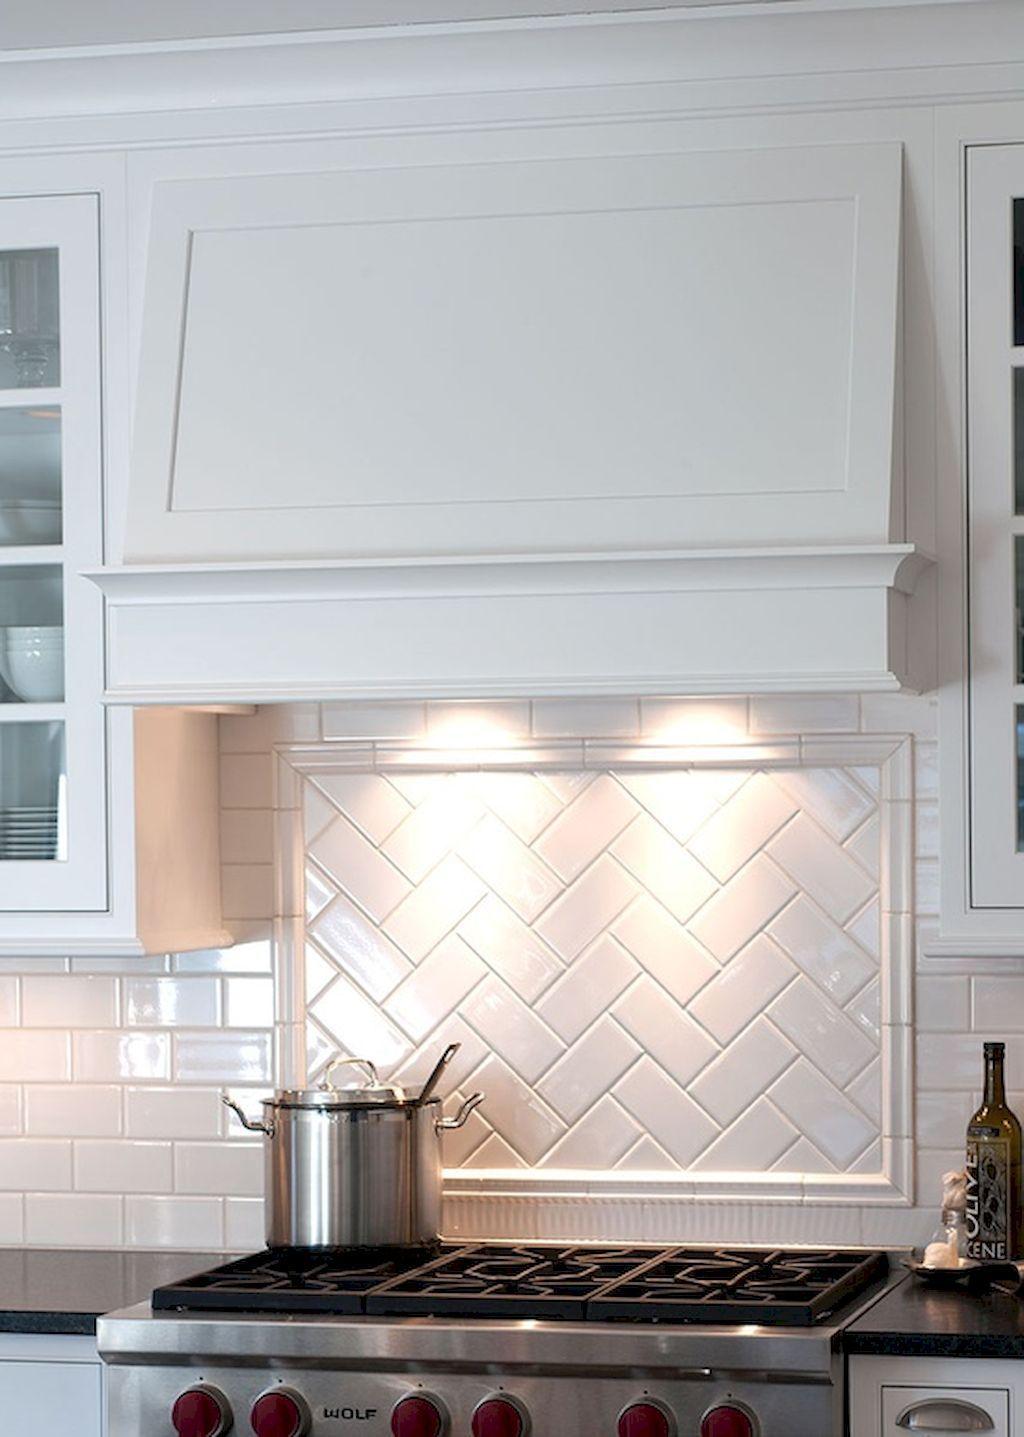 Beautiful kitchen backsplash tile patterns ideas (50